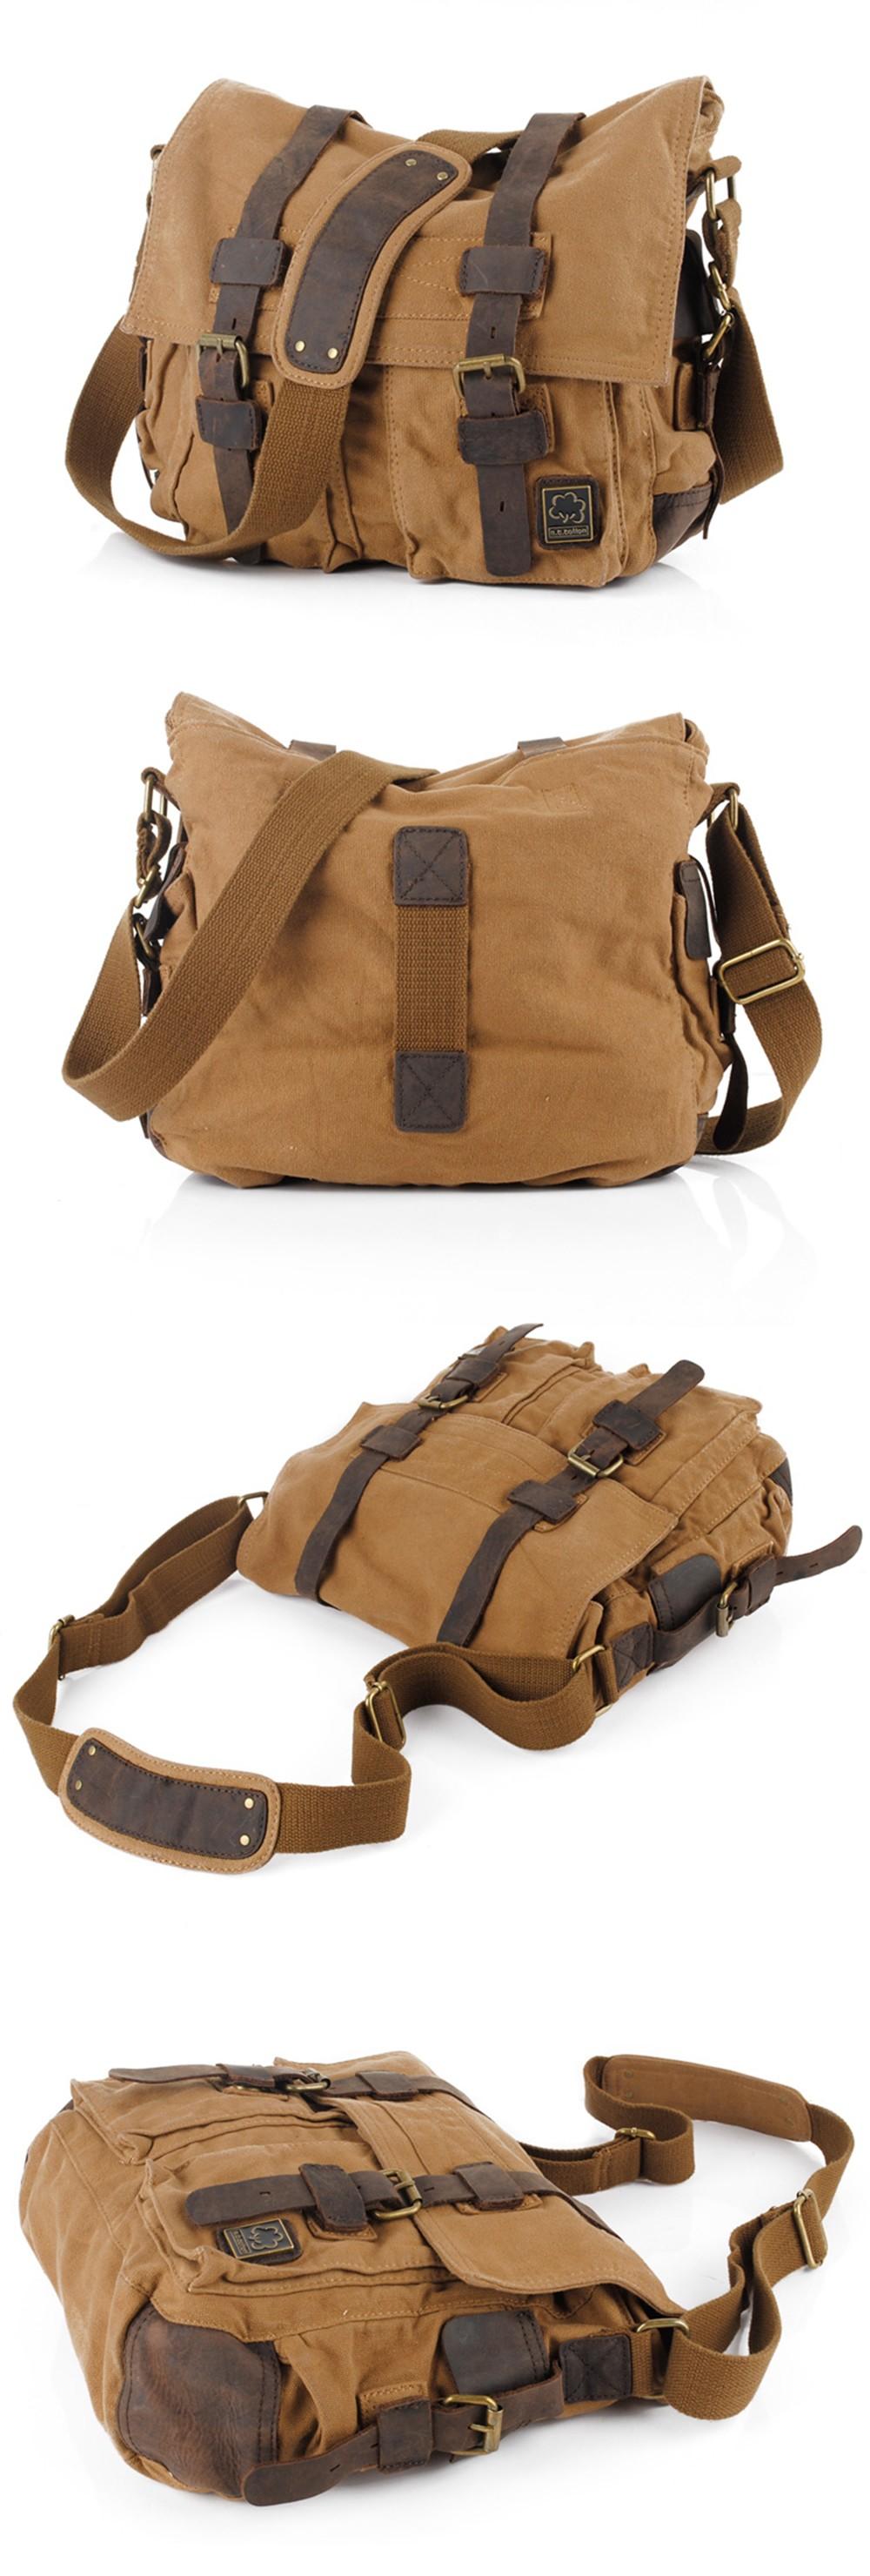 HTB1ZqzUKFXXXXXcaXXXq6xXFXXXe - Men's Canvas Military Fashion Shoulder Bag-Men's Canvas Military Fashion Shoulder Bag